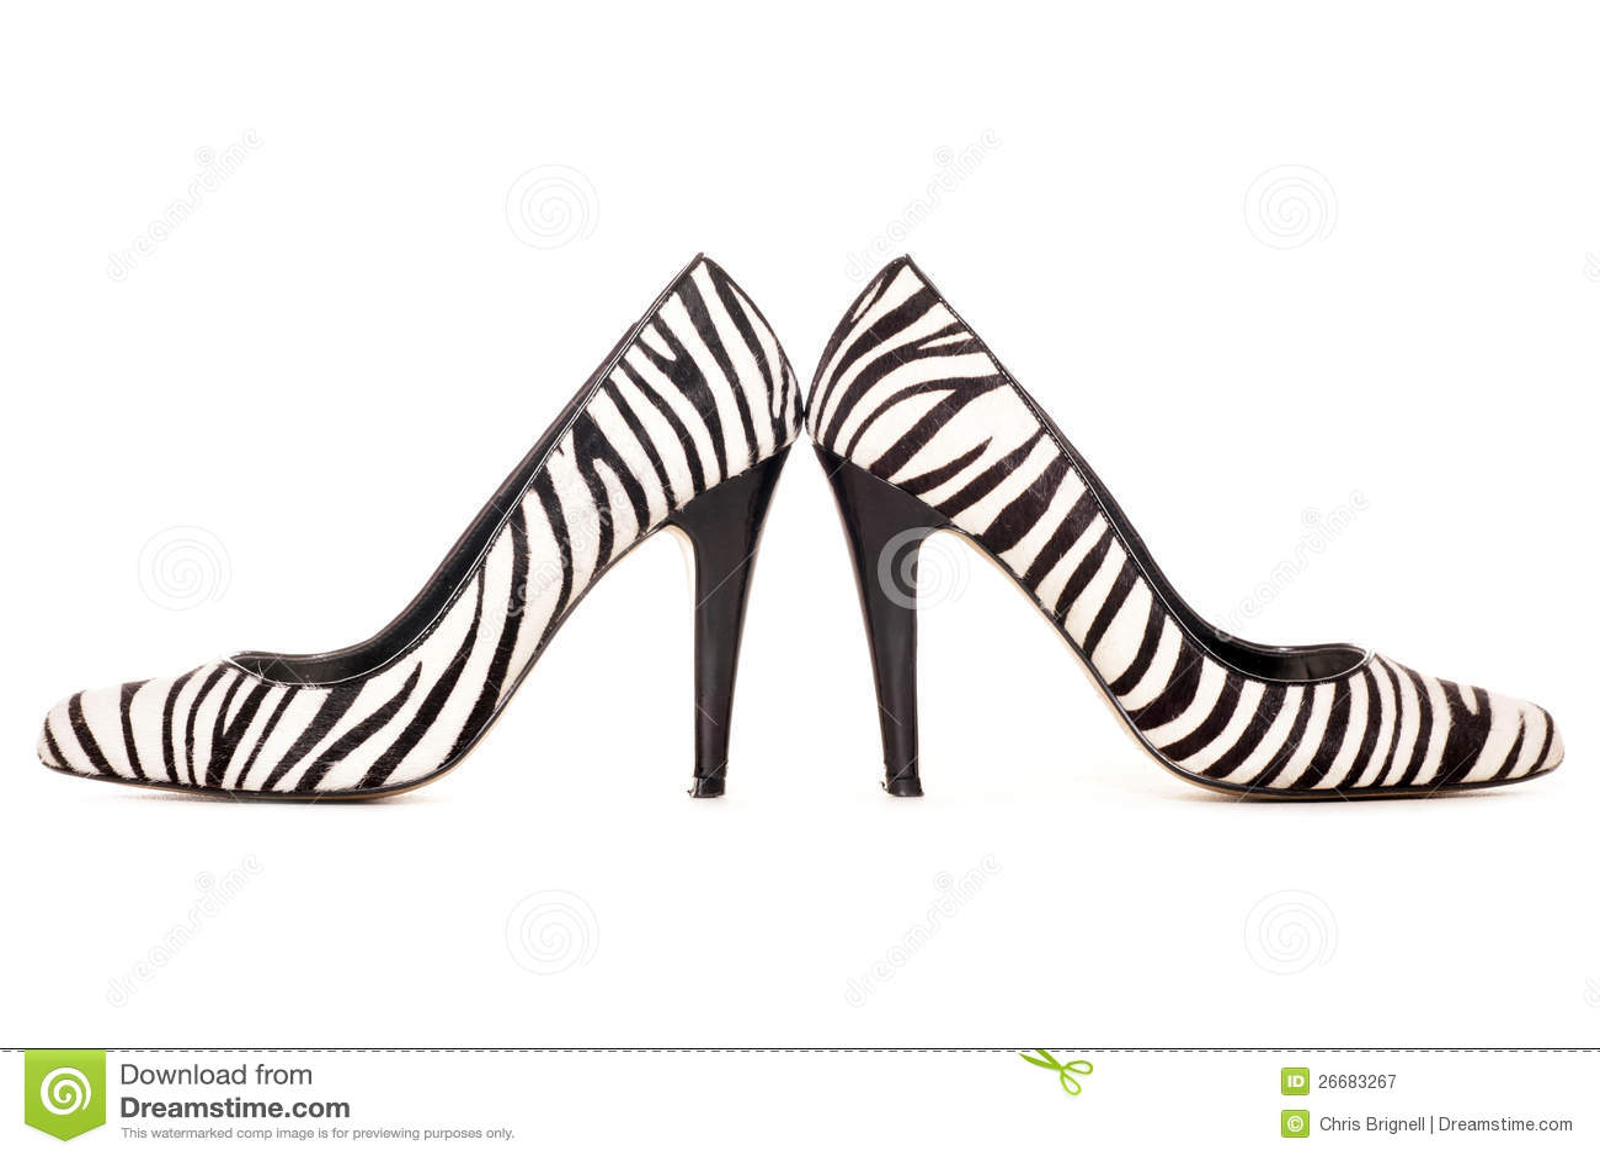 Zebra Pattern High Heel Shoes Royalty Free Stock